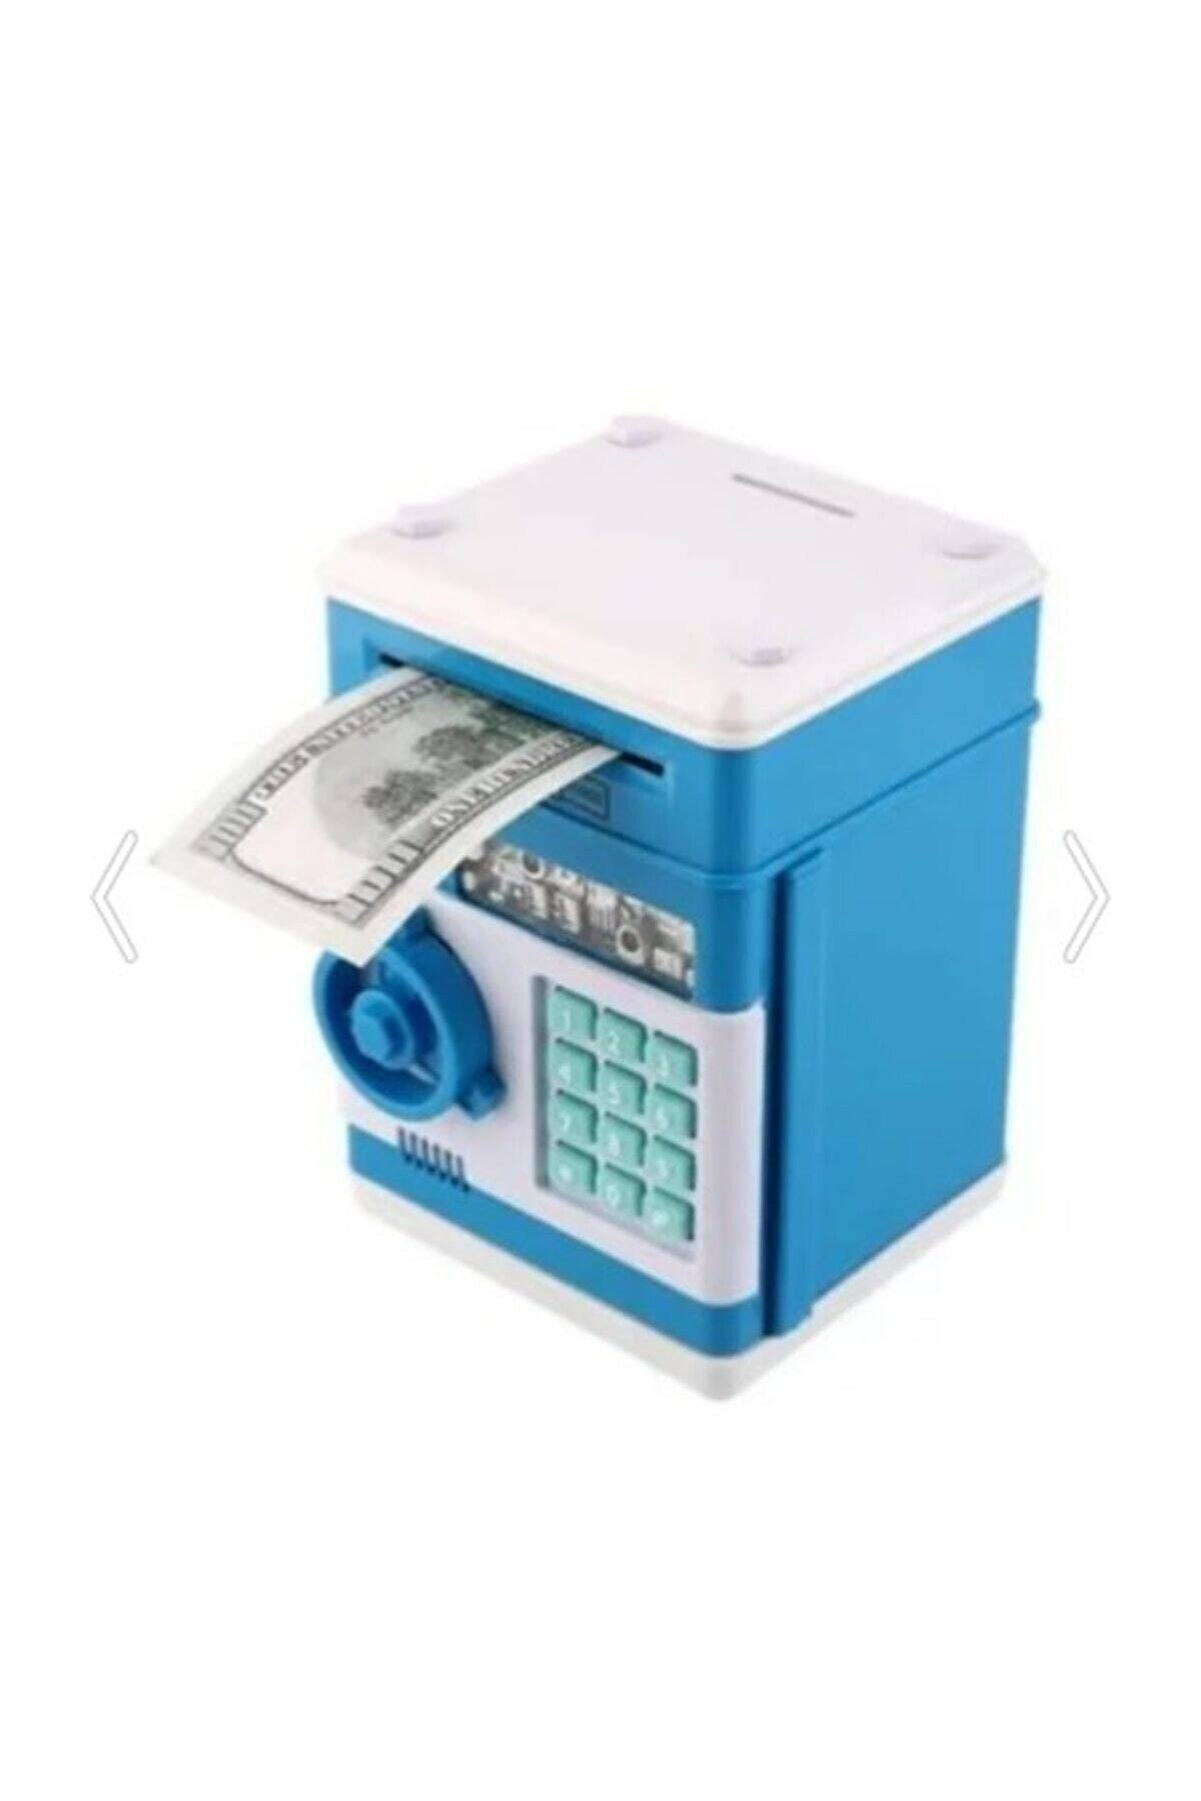 ELBA Şifreli Otomatik Kağıt Para Alan Atm Kasa Kumbara - Mavi